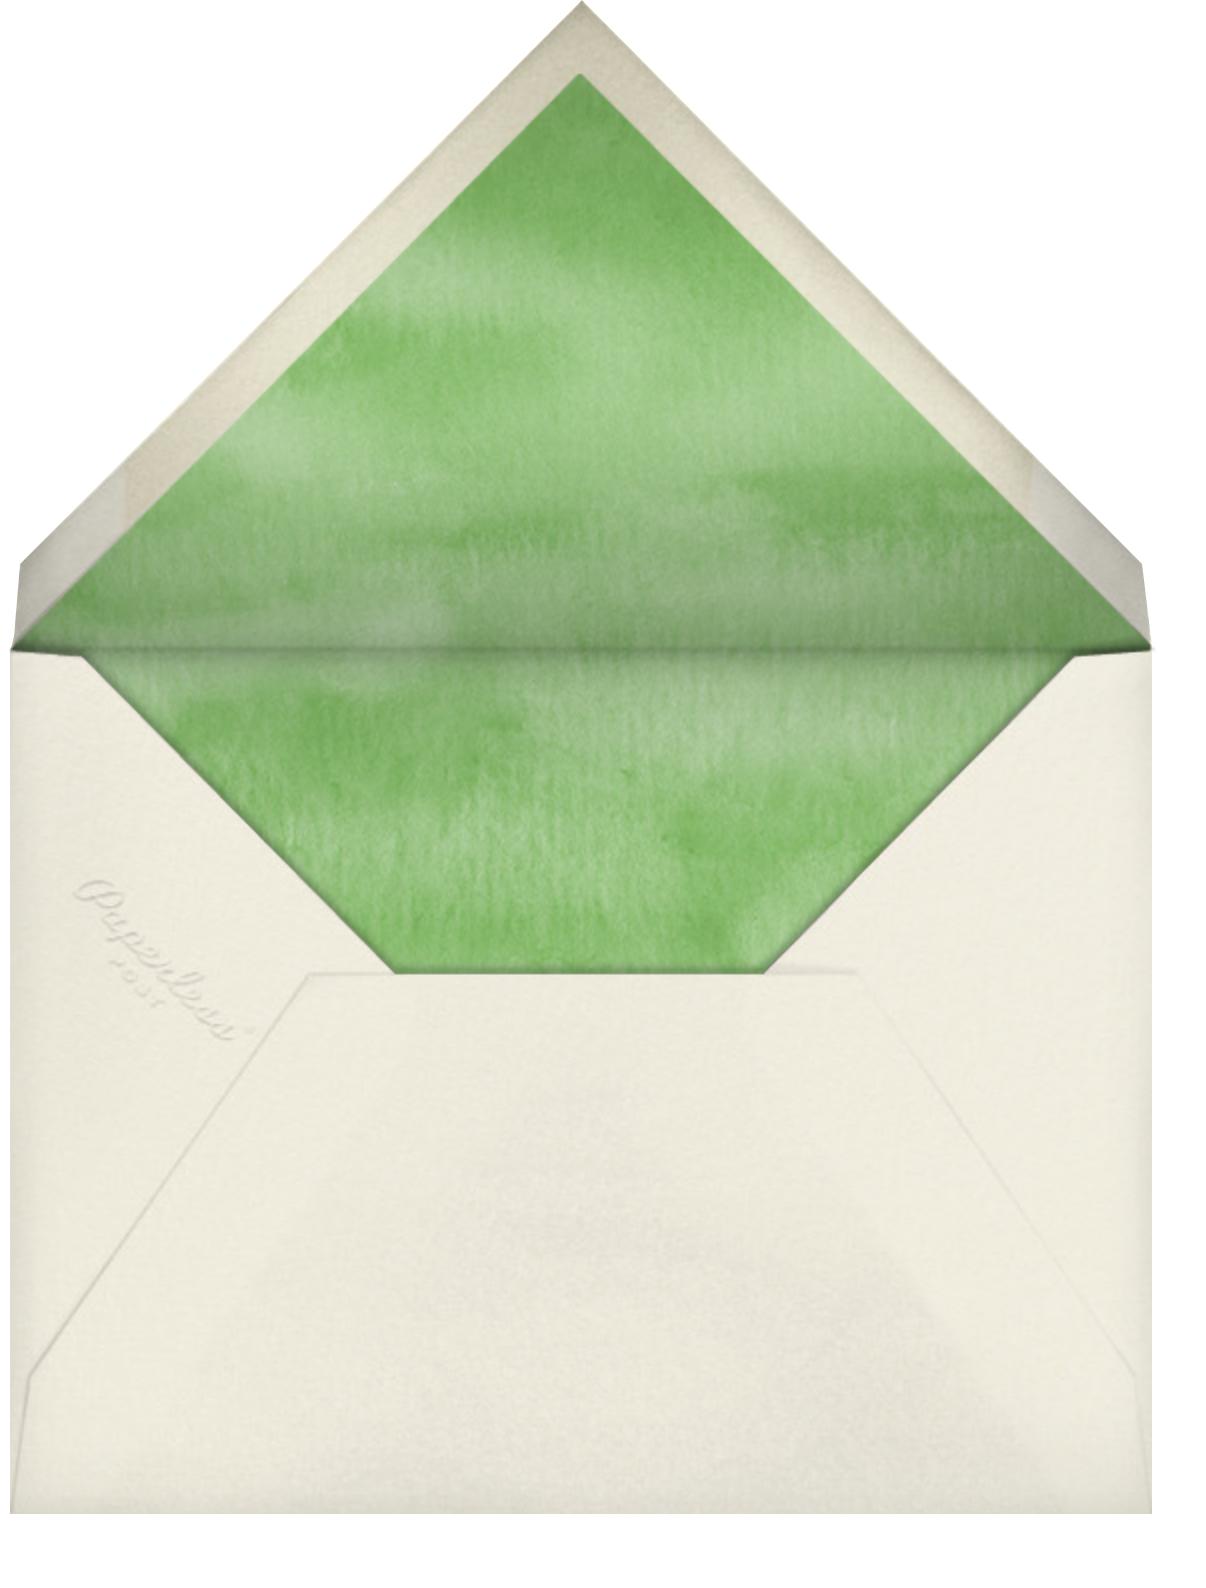 Nest Eggs - Felix Doolittle - Woodland baby shower invitations - envelope back